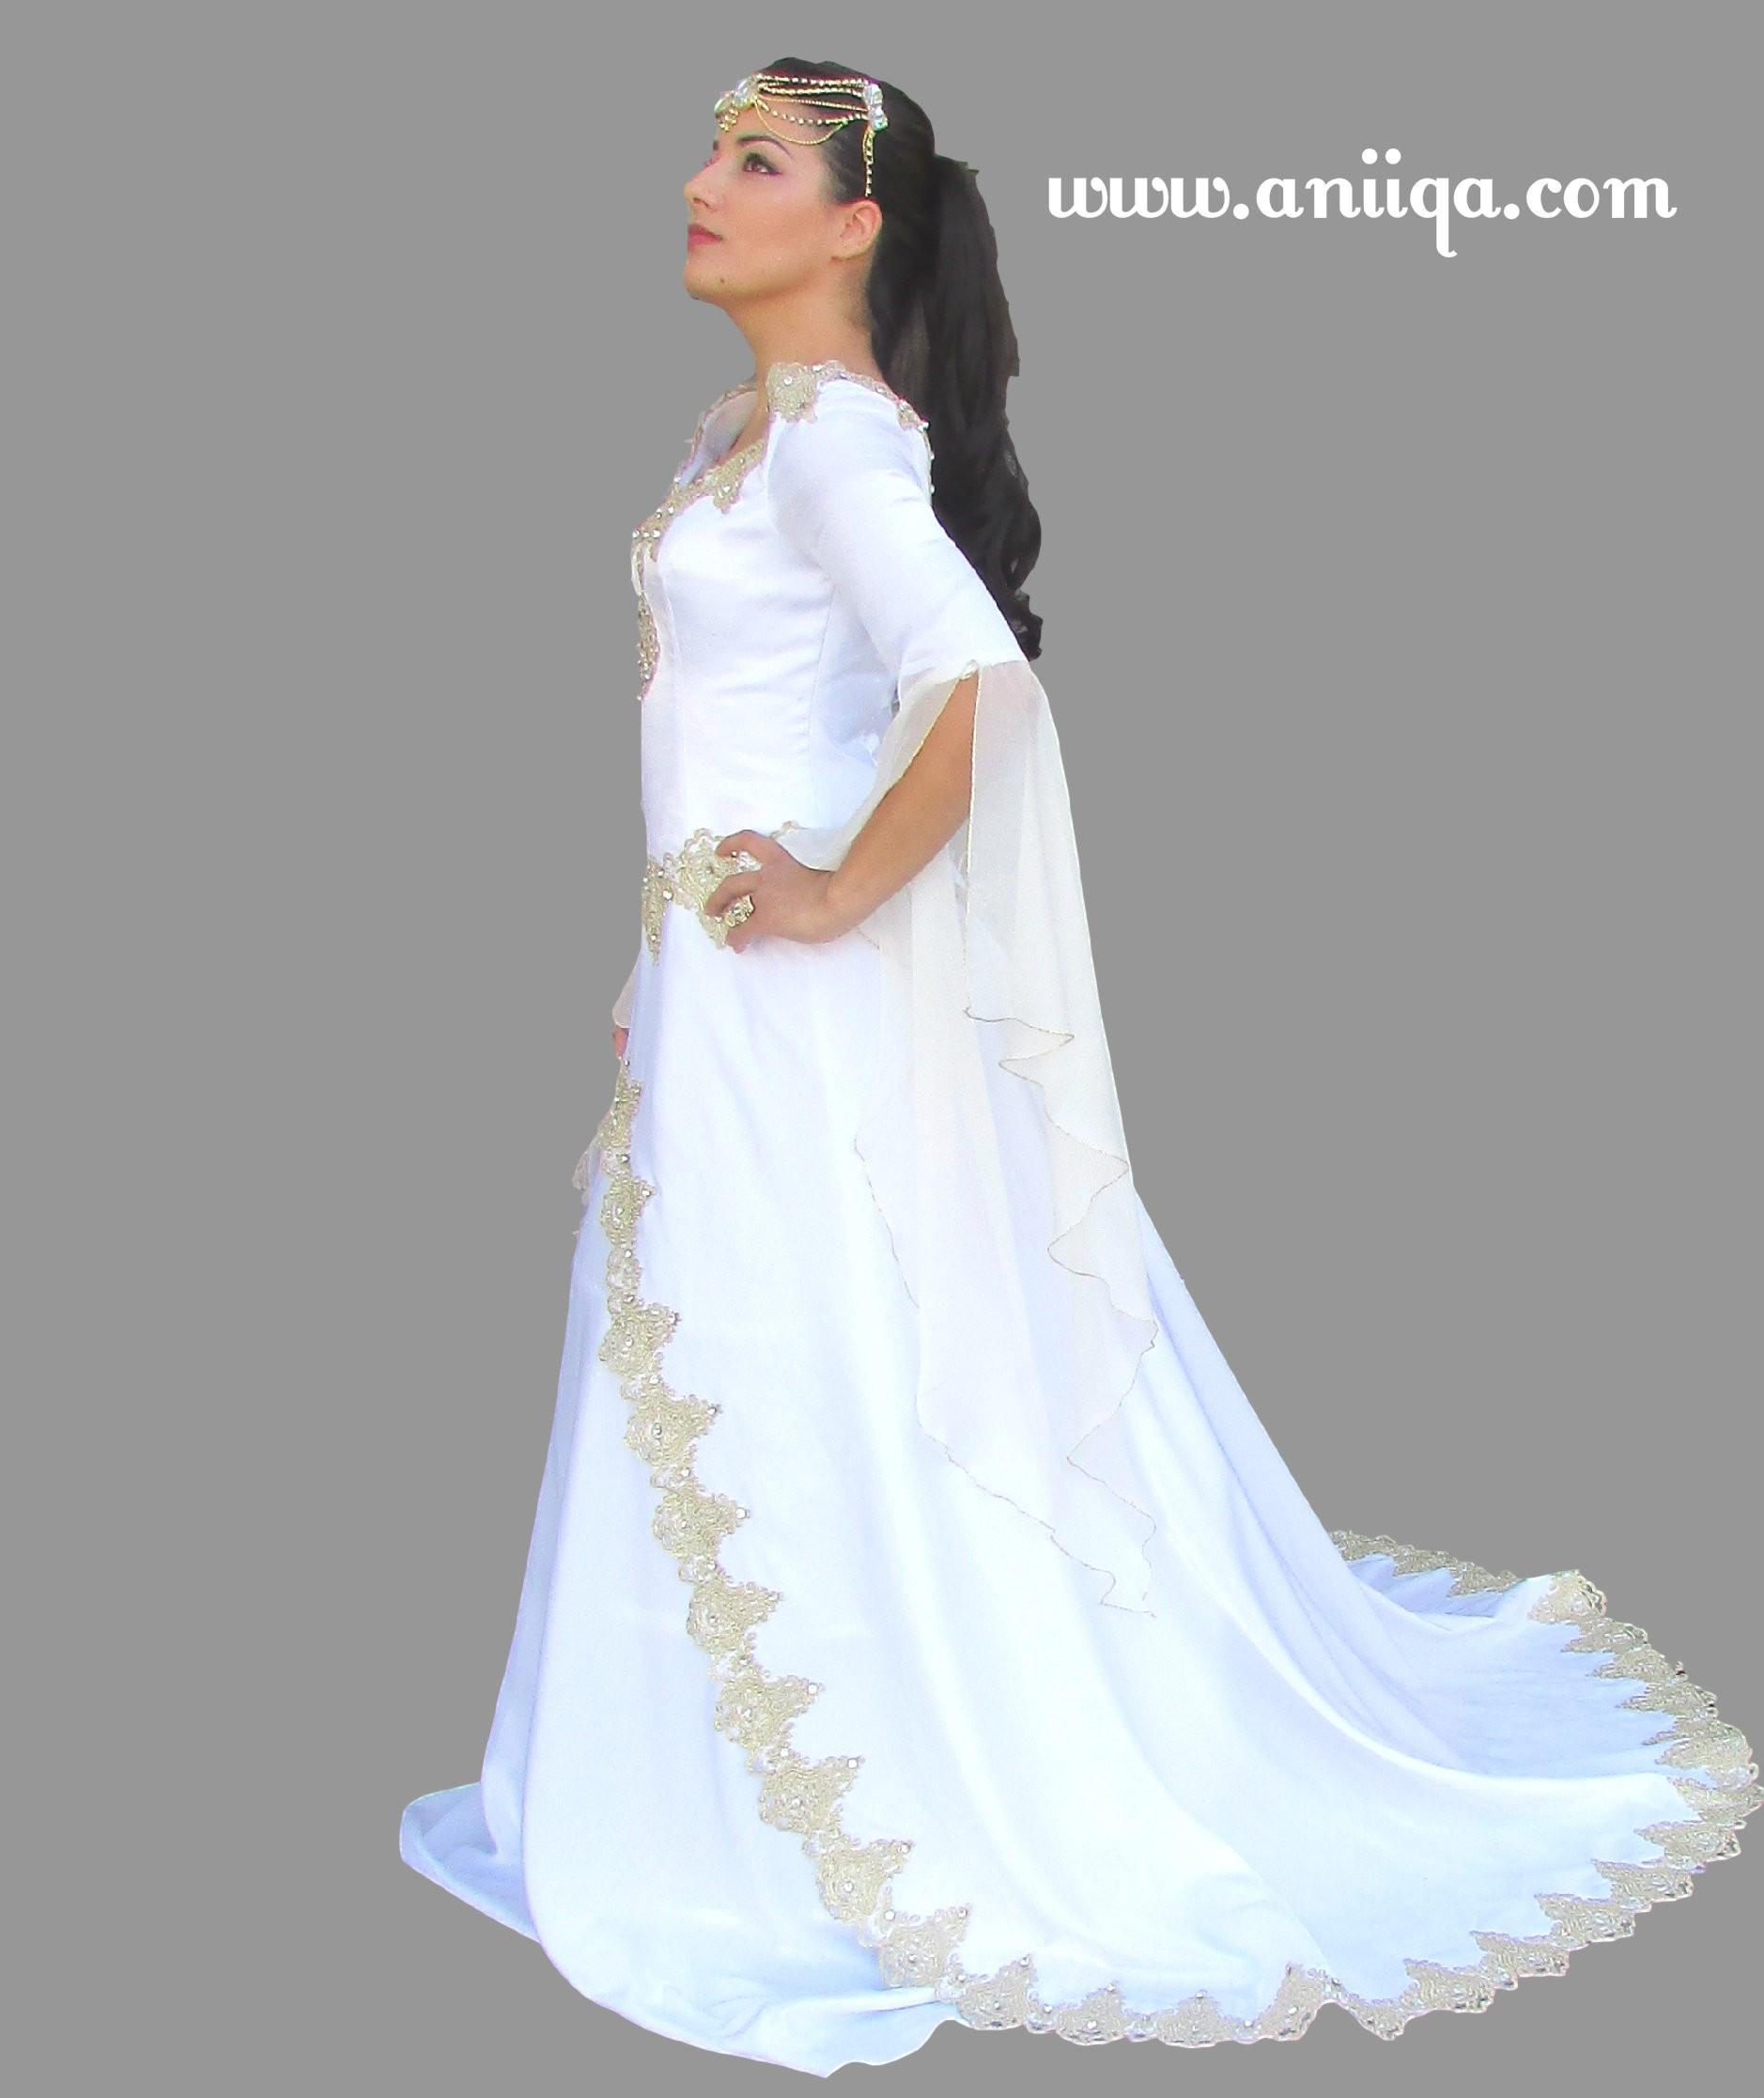 Robe mariage musulman pas cher